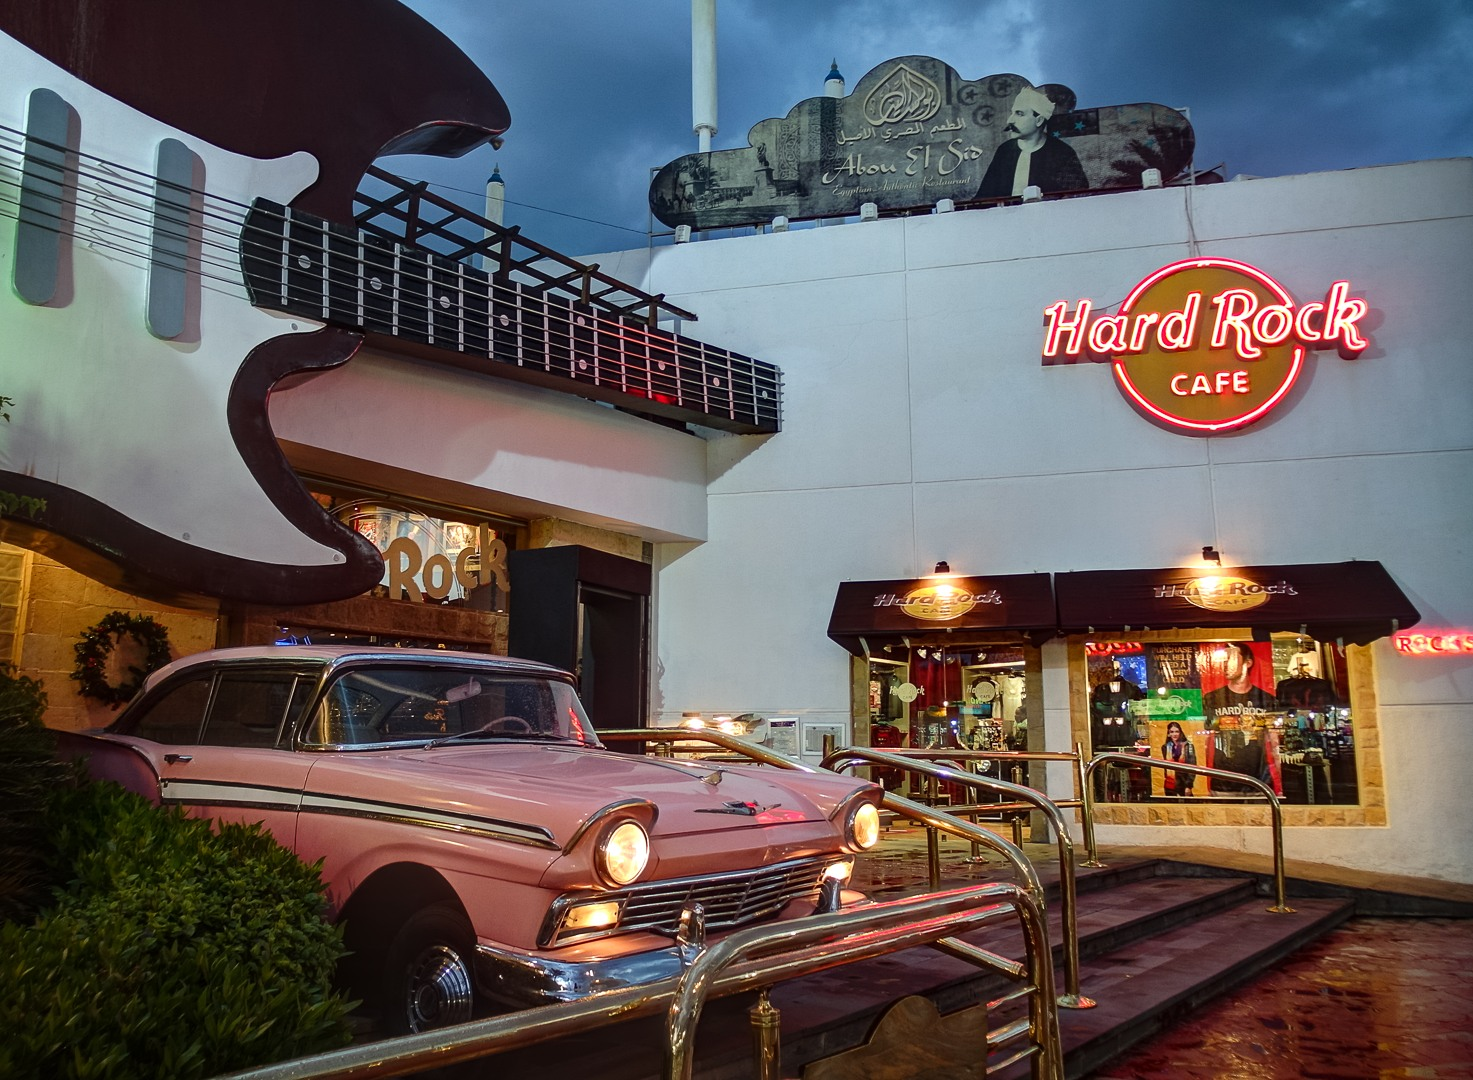 Hard Rock Cafe in Sharm El Sheikh